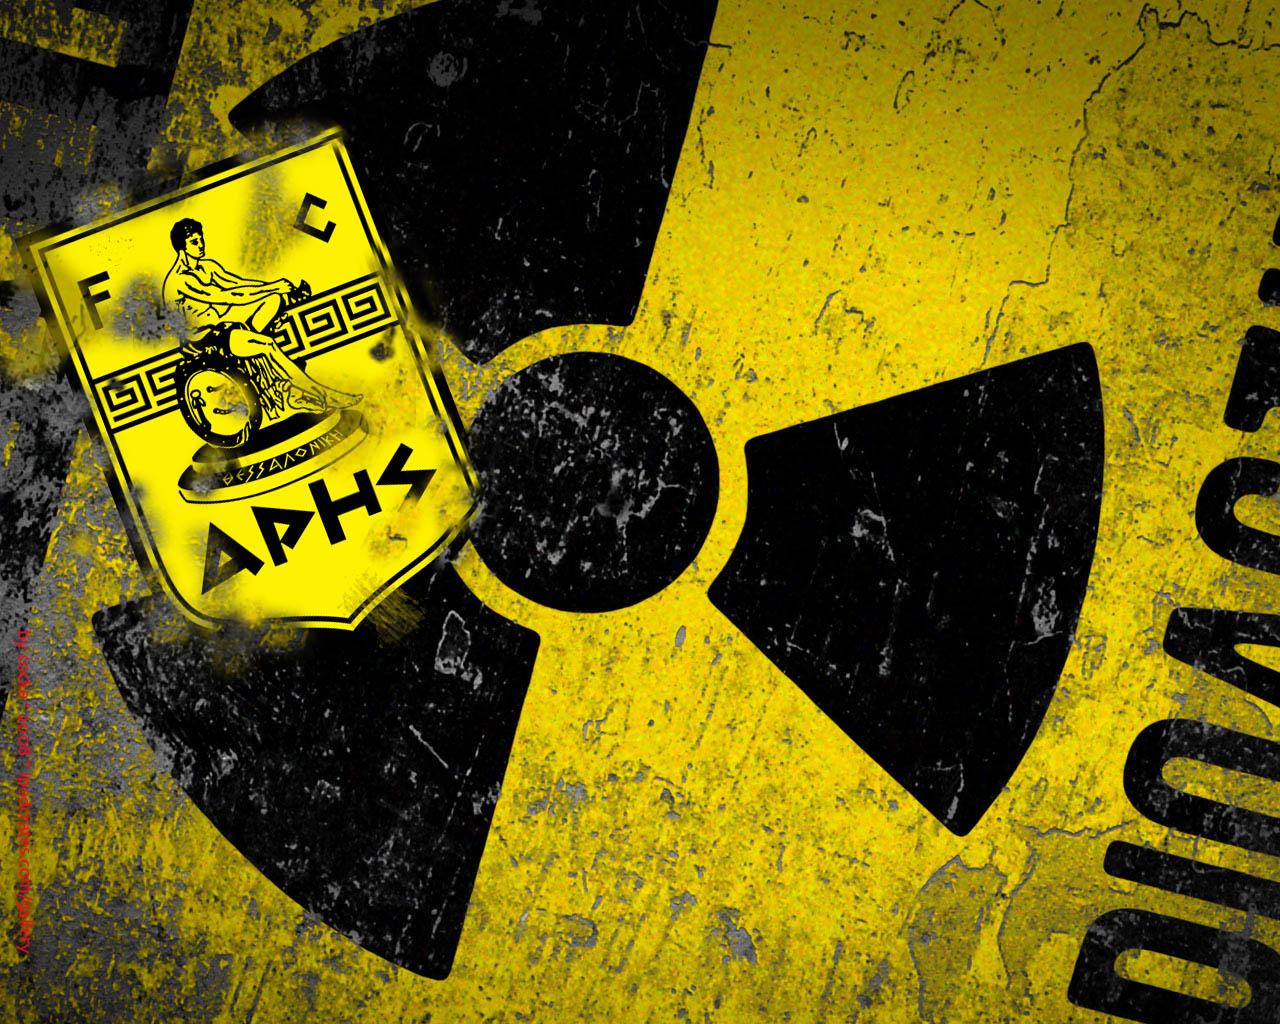 http://1.bp.blogspot.com/_6vbpJfdXQkw/TFITjh6-ZyI/AAAAAAAAB78/DMkEA6x6zDM/s1600/Aris-nuclear.jpg